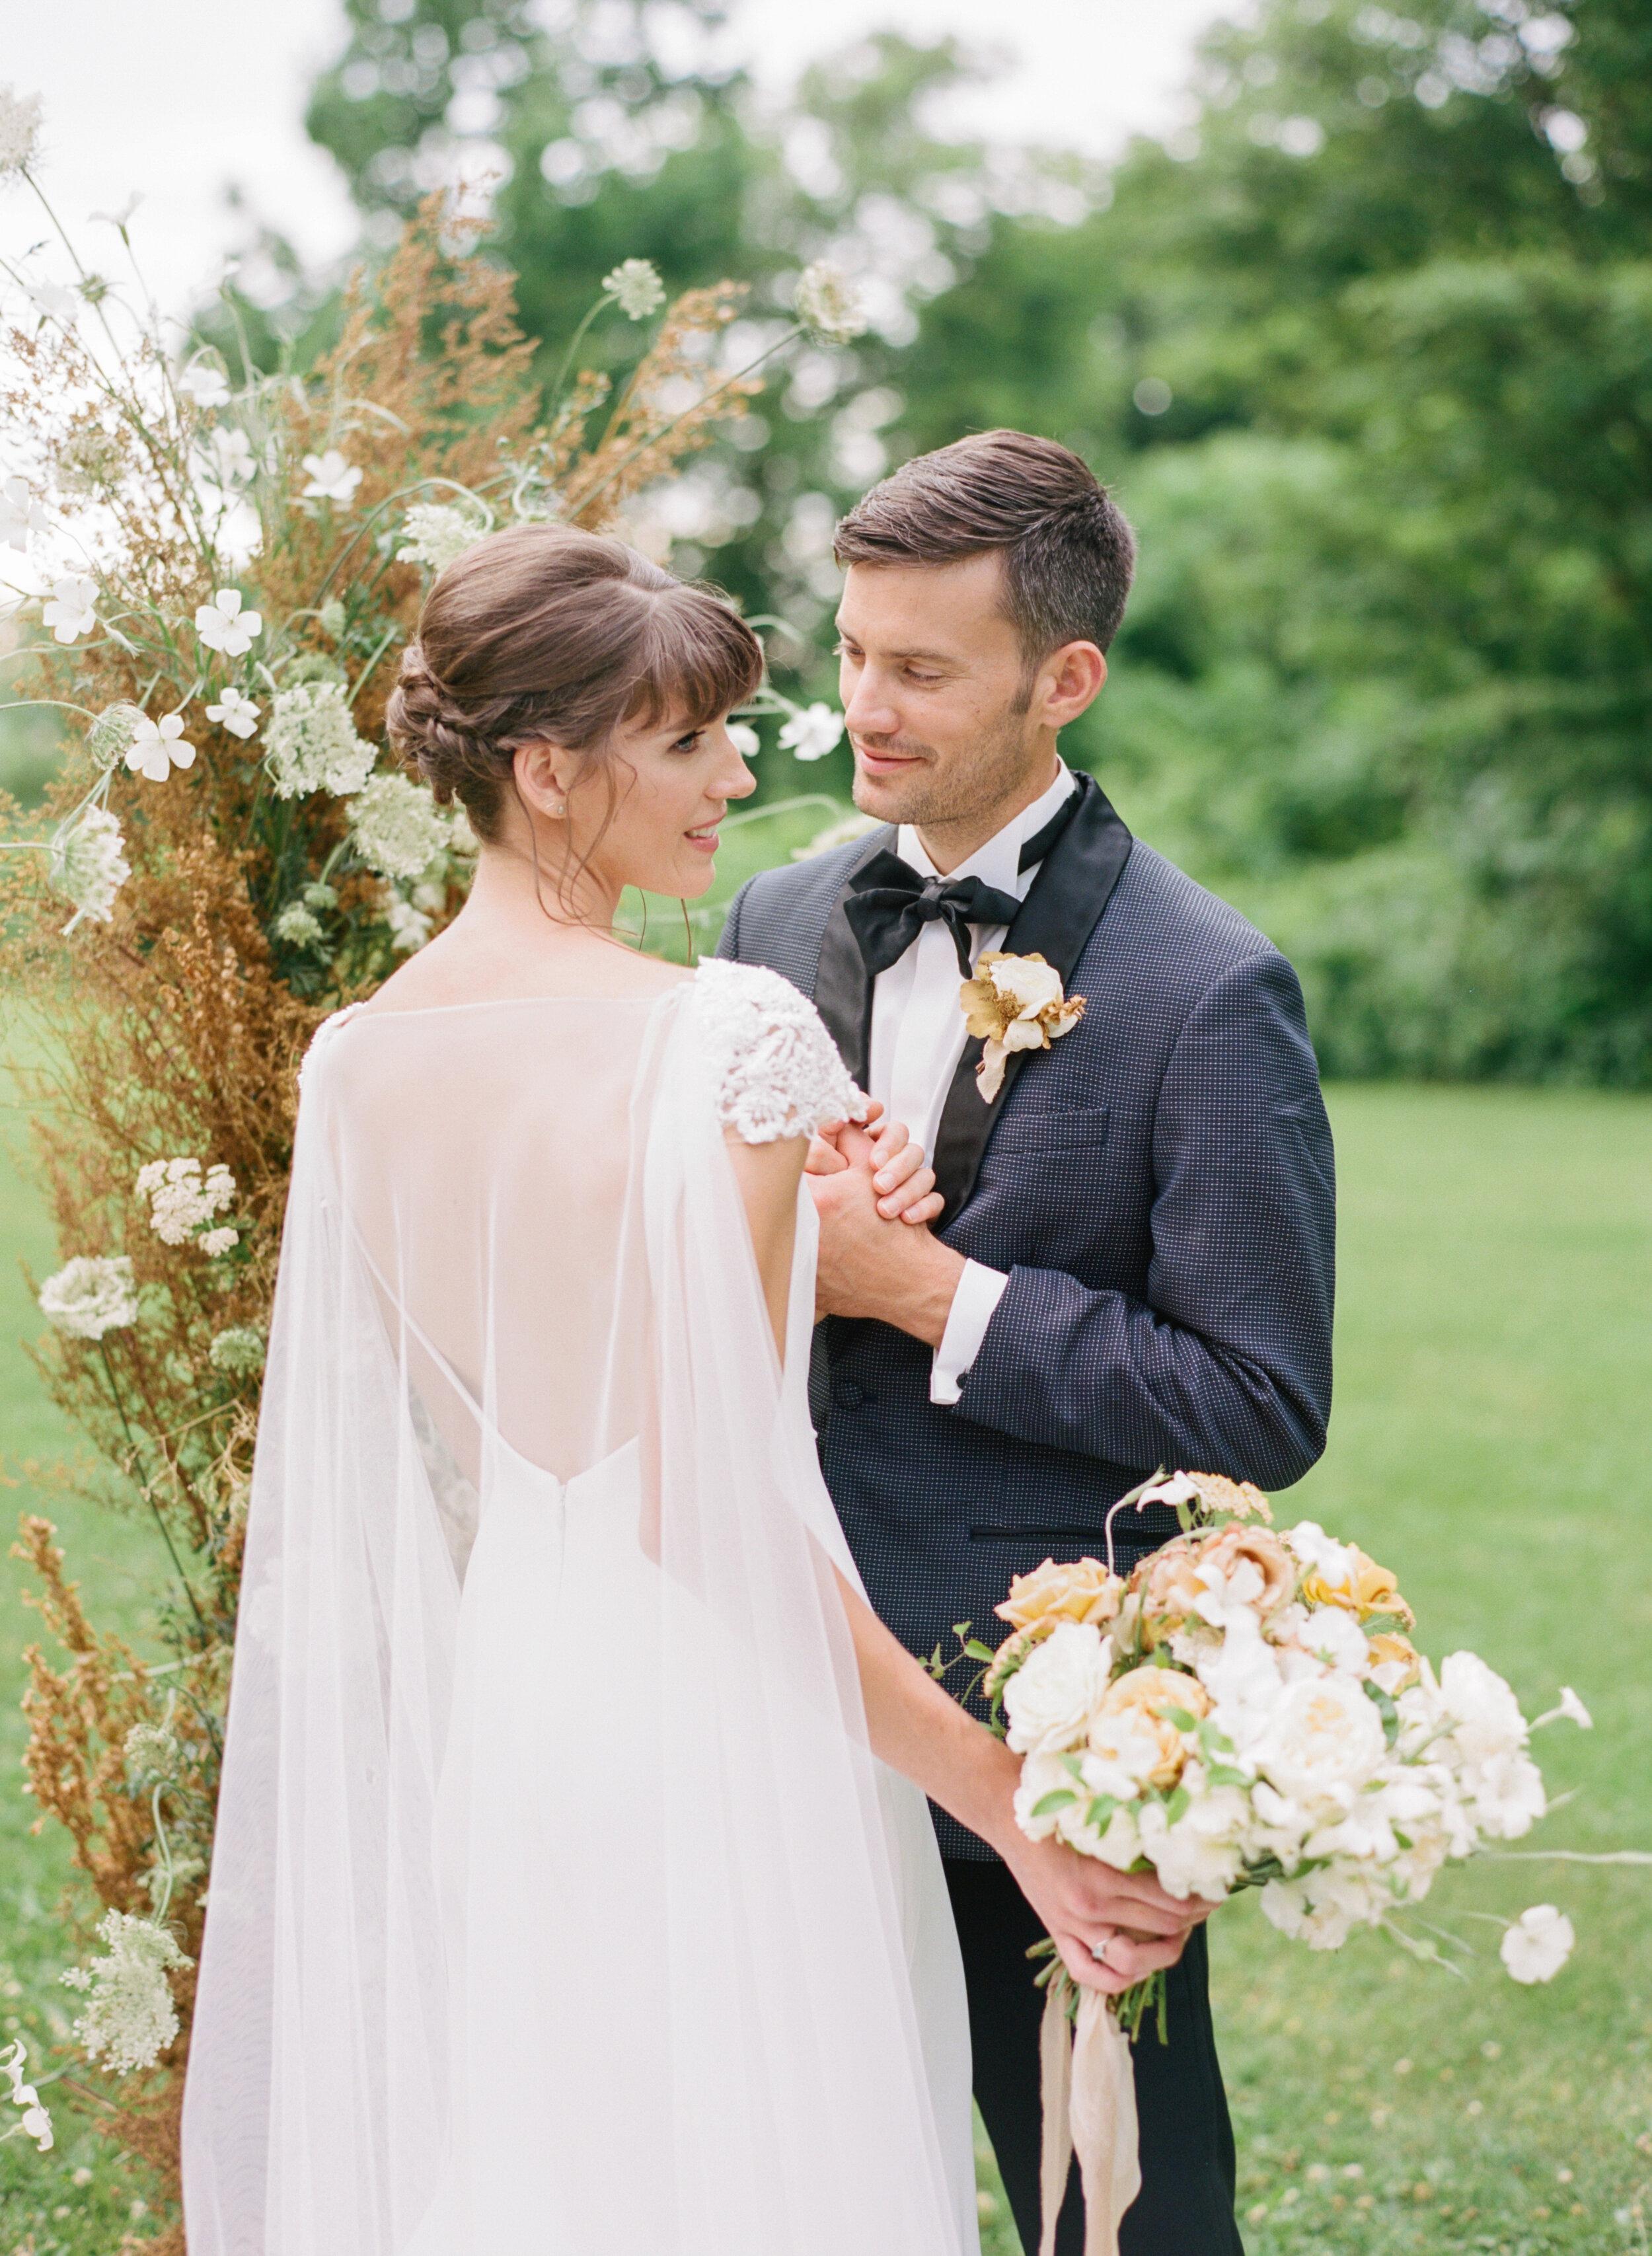 alexandra-meseke-understated-soft-luxury-wedding-upstate-ny_0111.jpg